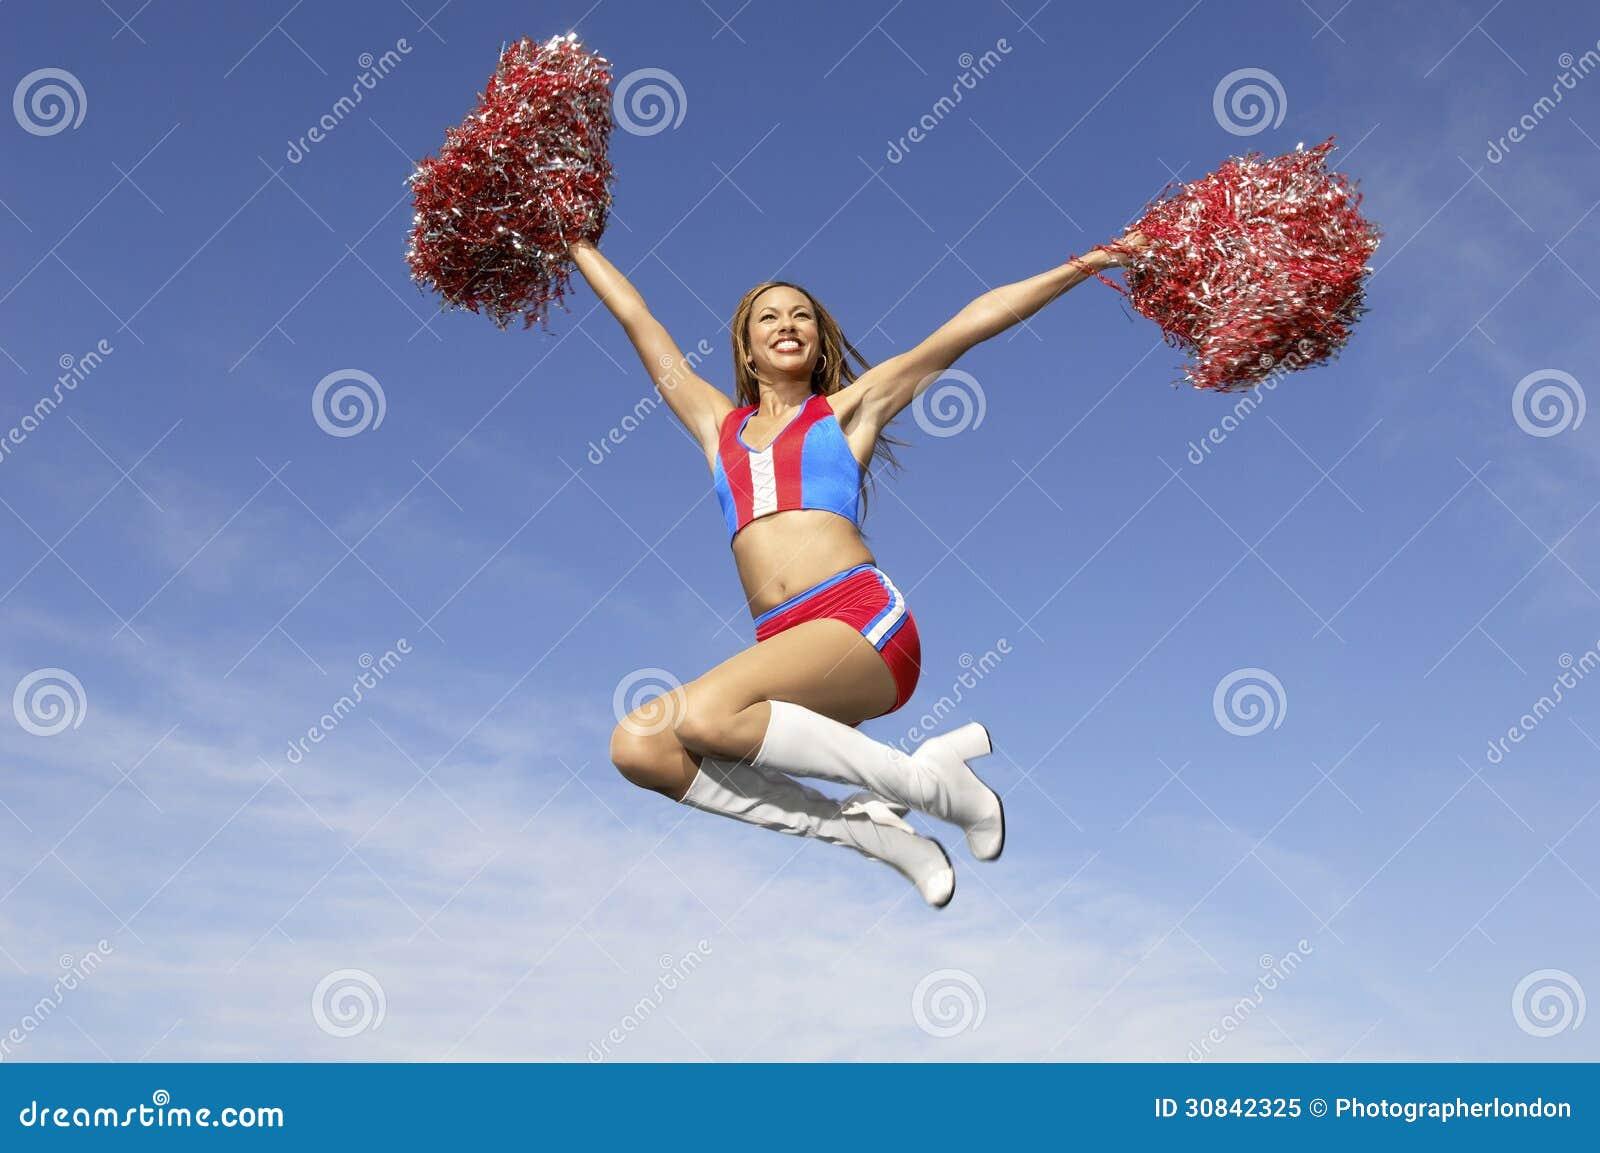 Cheerleader Jumping Midair With Pom Poms